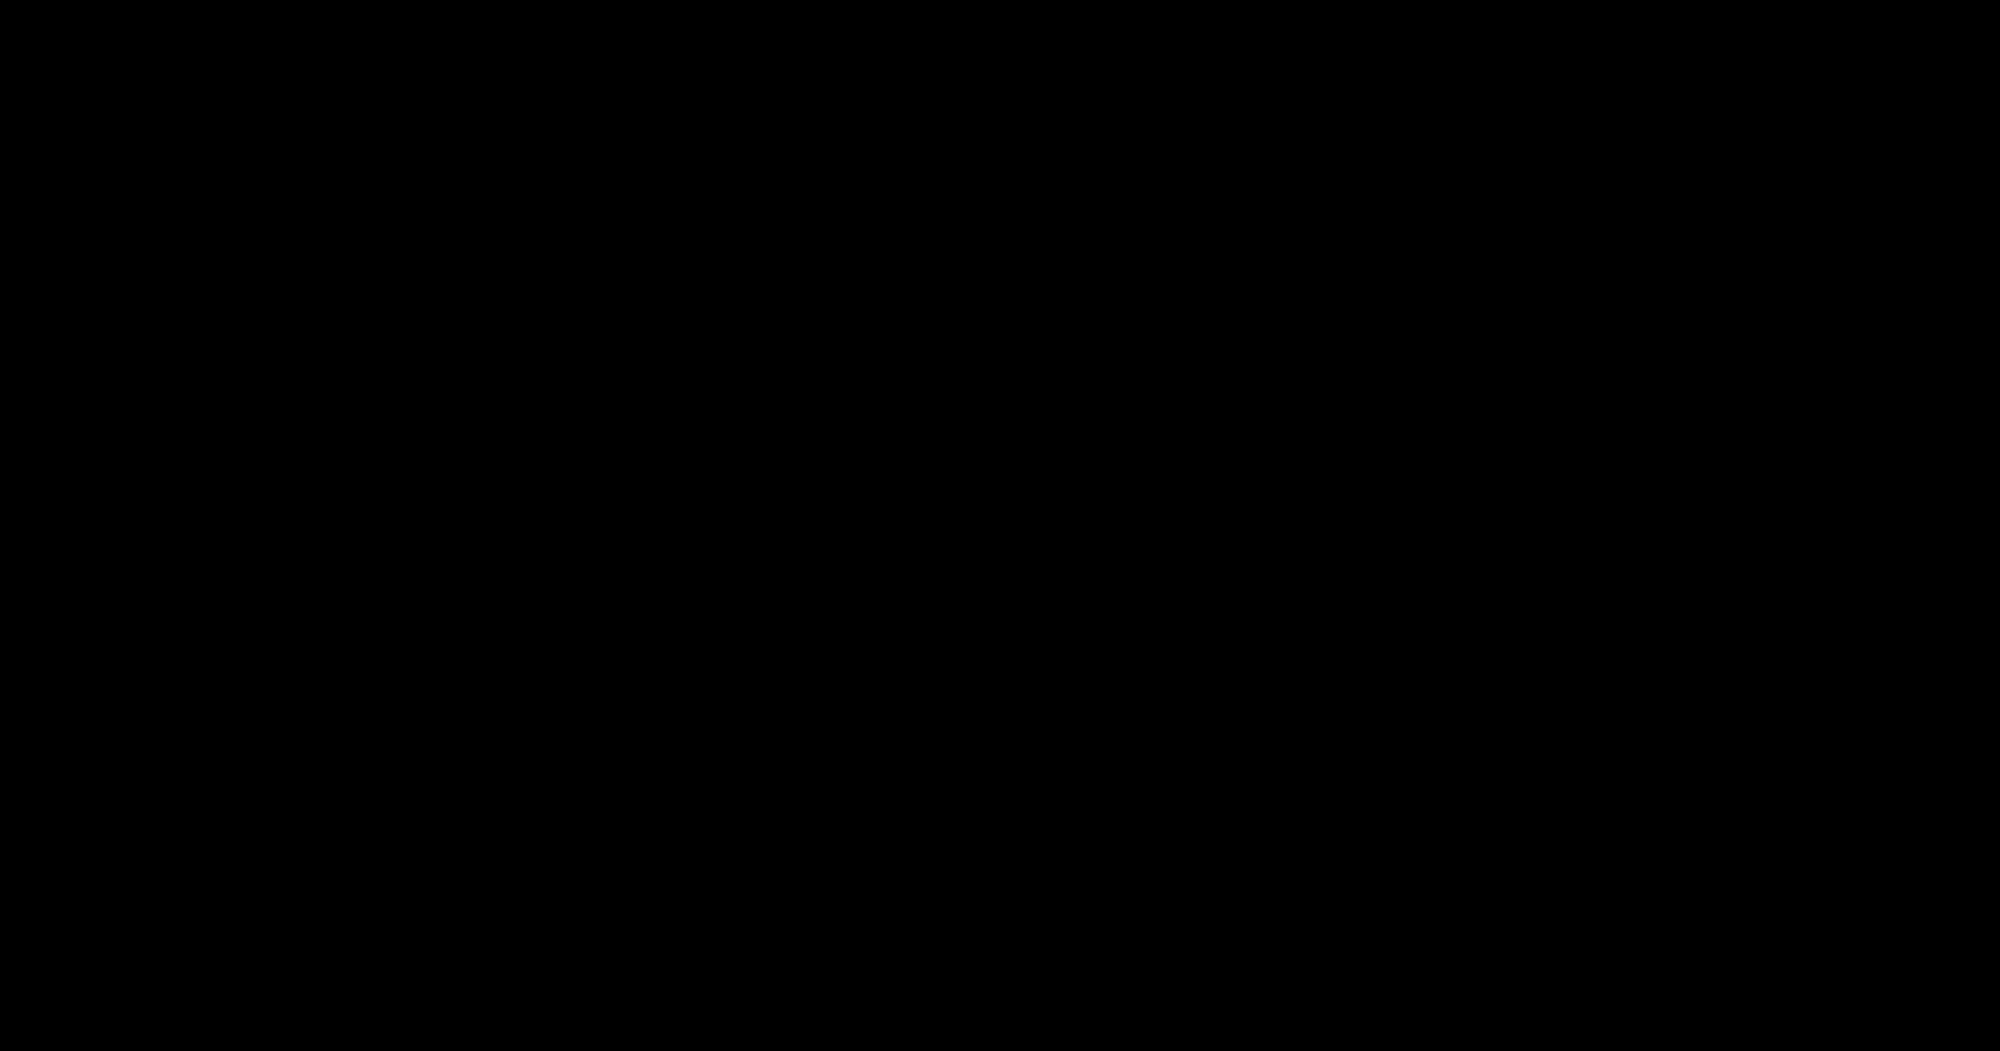 Hosel & Ferrule Books-logo-black.png